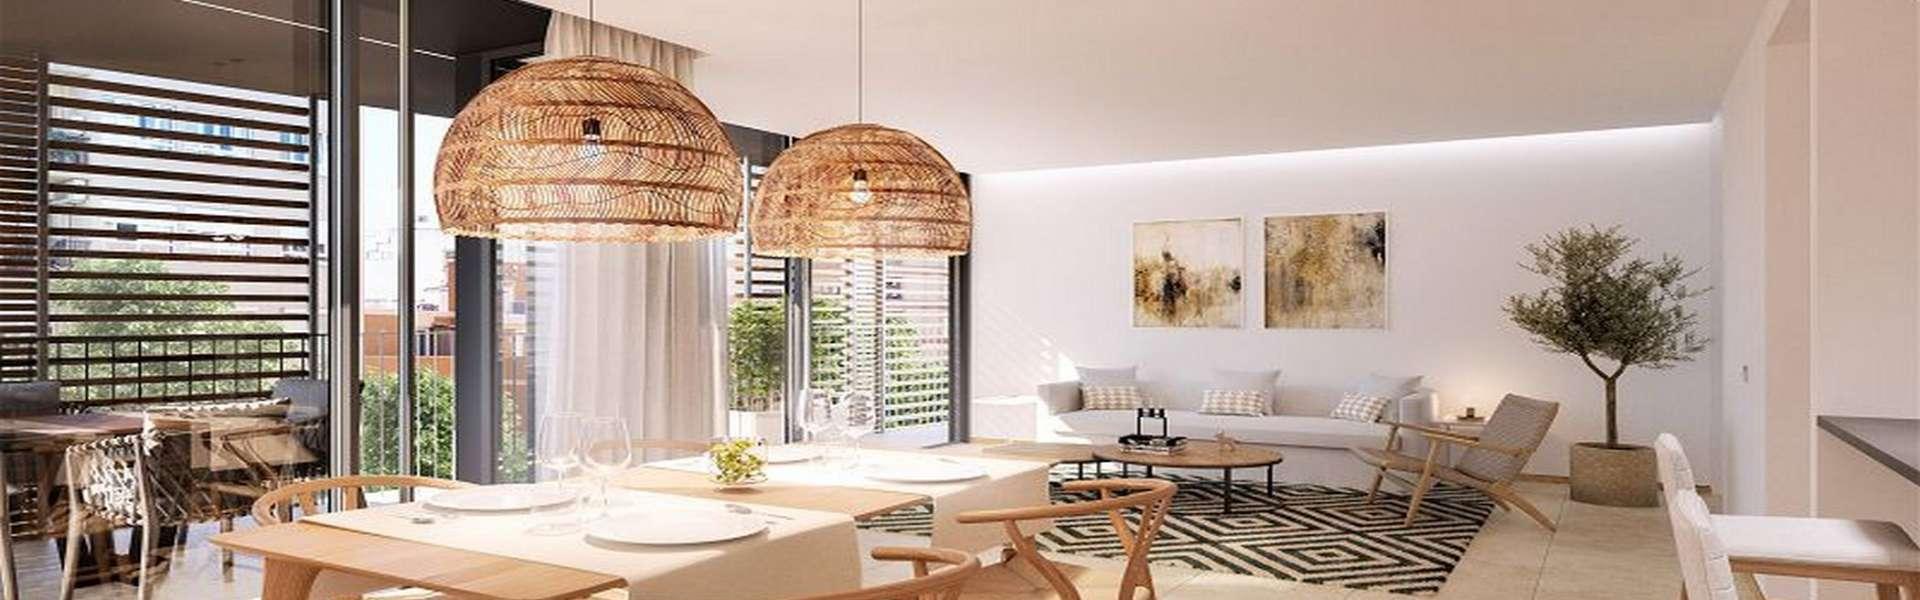 Palma/Santa Catalina - Neubau Apartments in Top-Lage